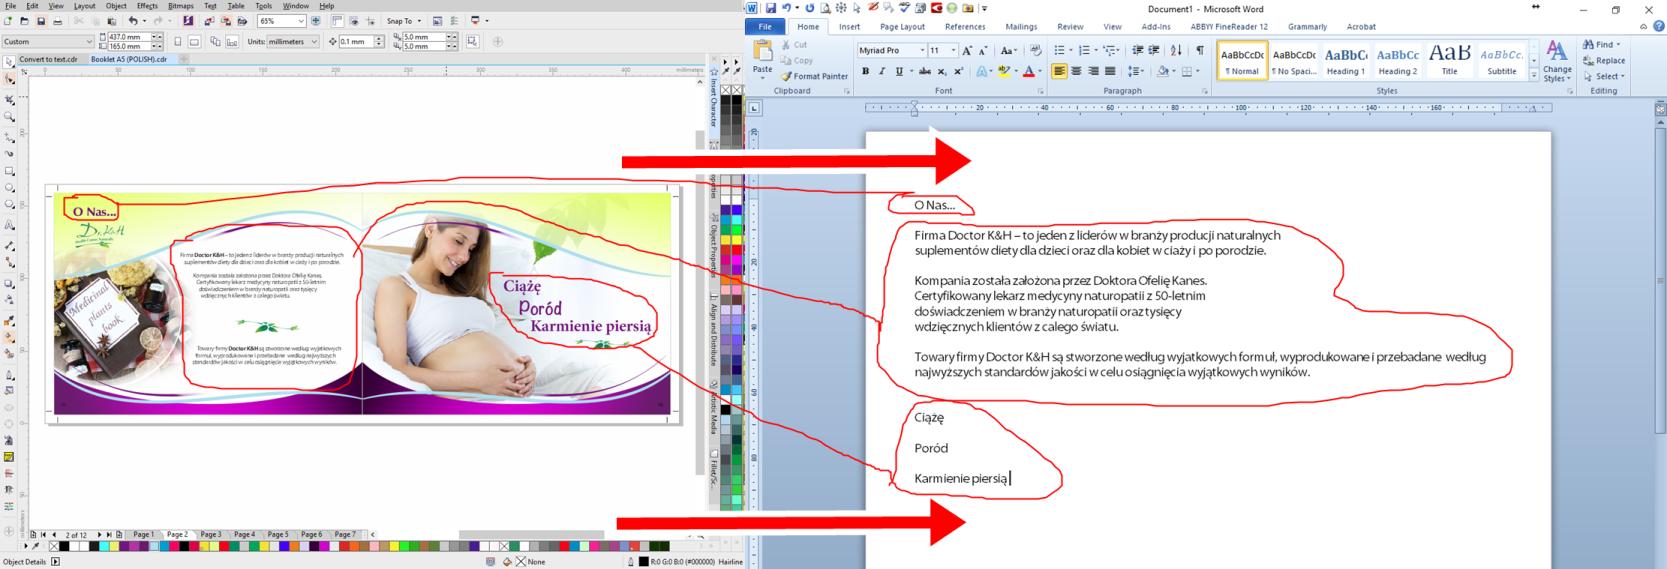 macro wont make excel send pdf